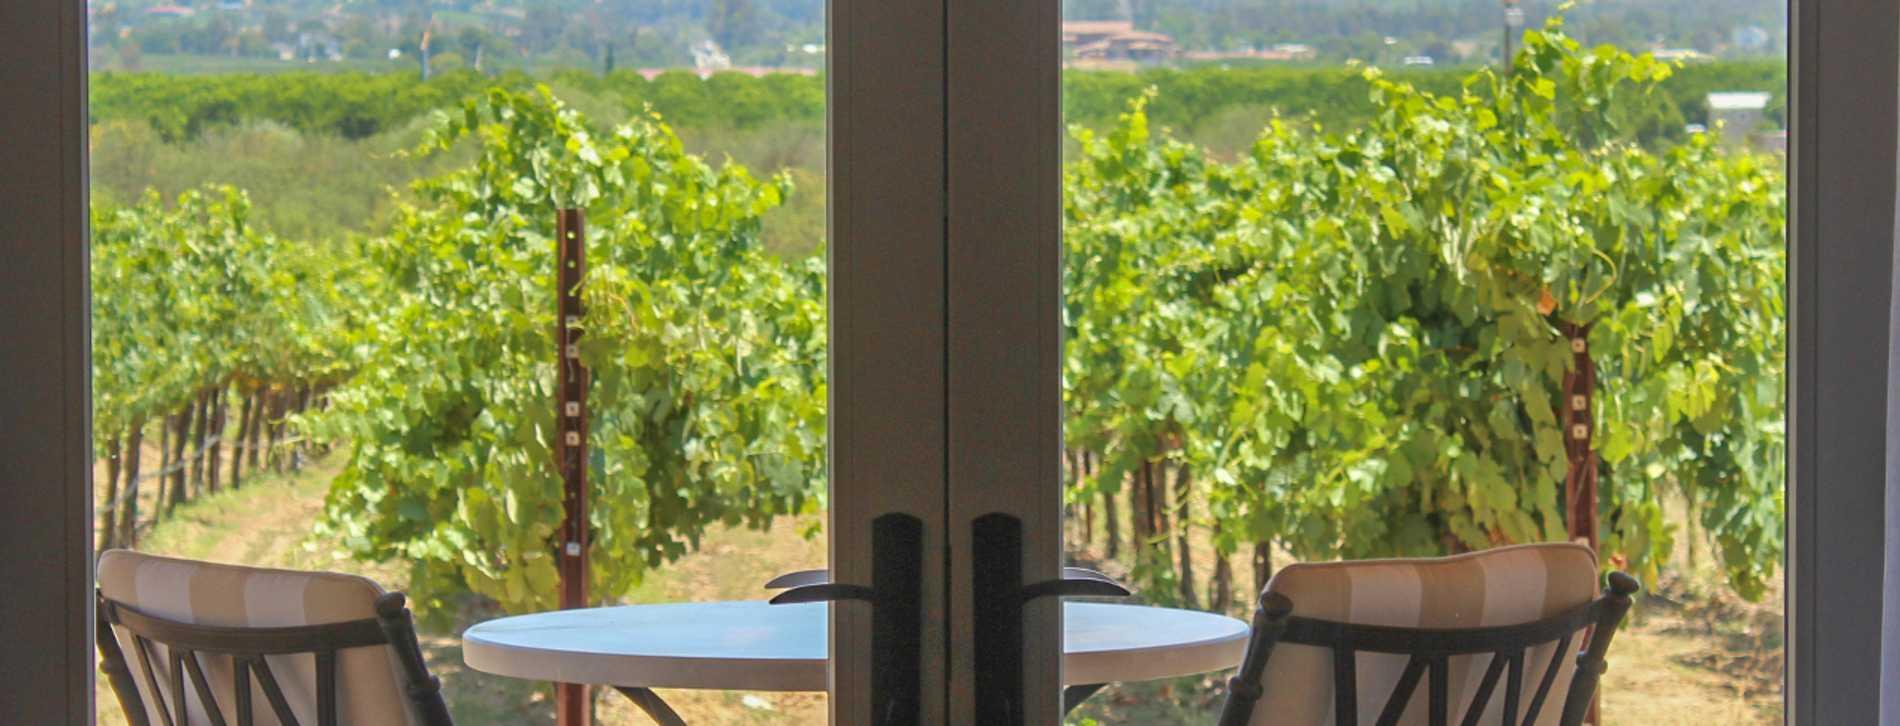 Carter Estate Vineyard View - Temecula